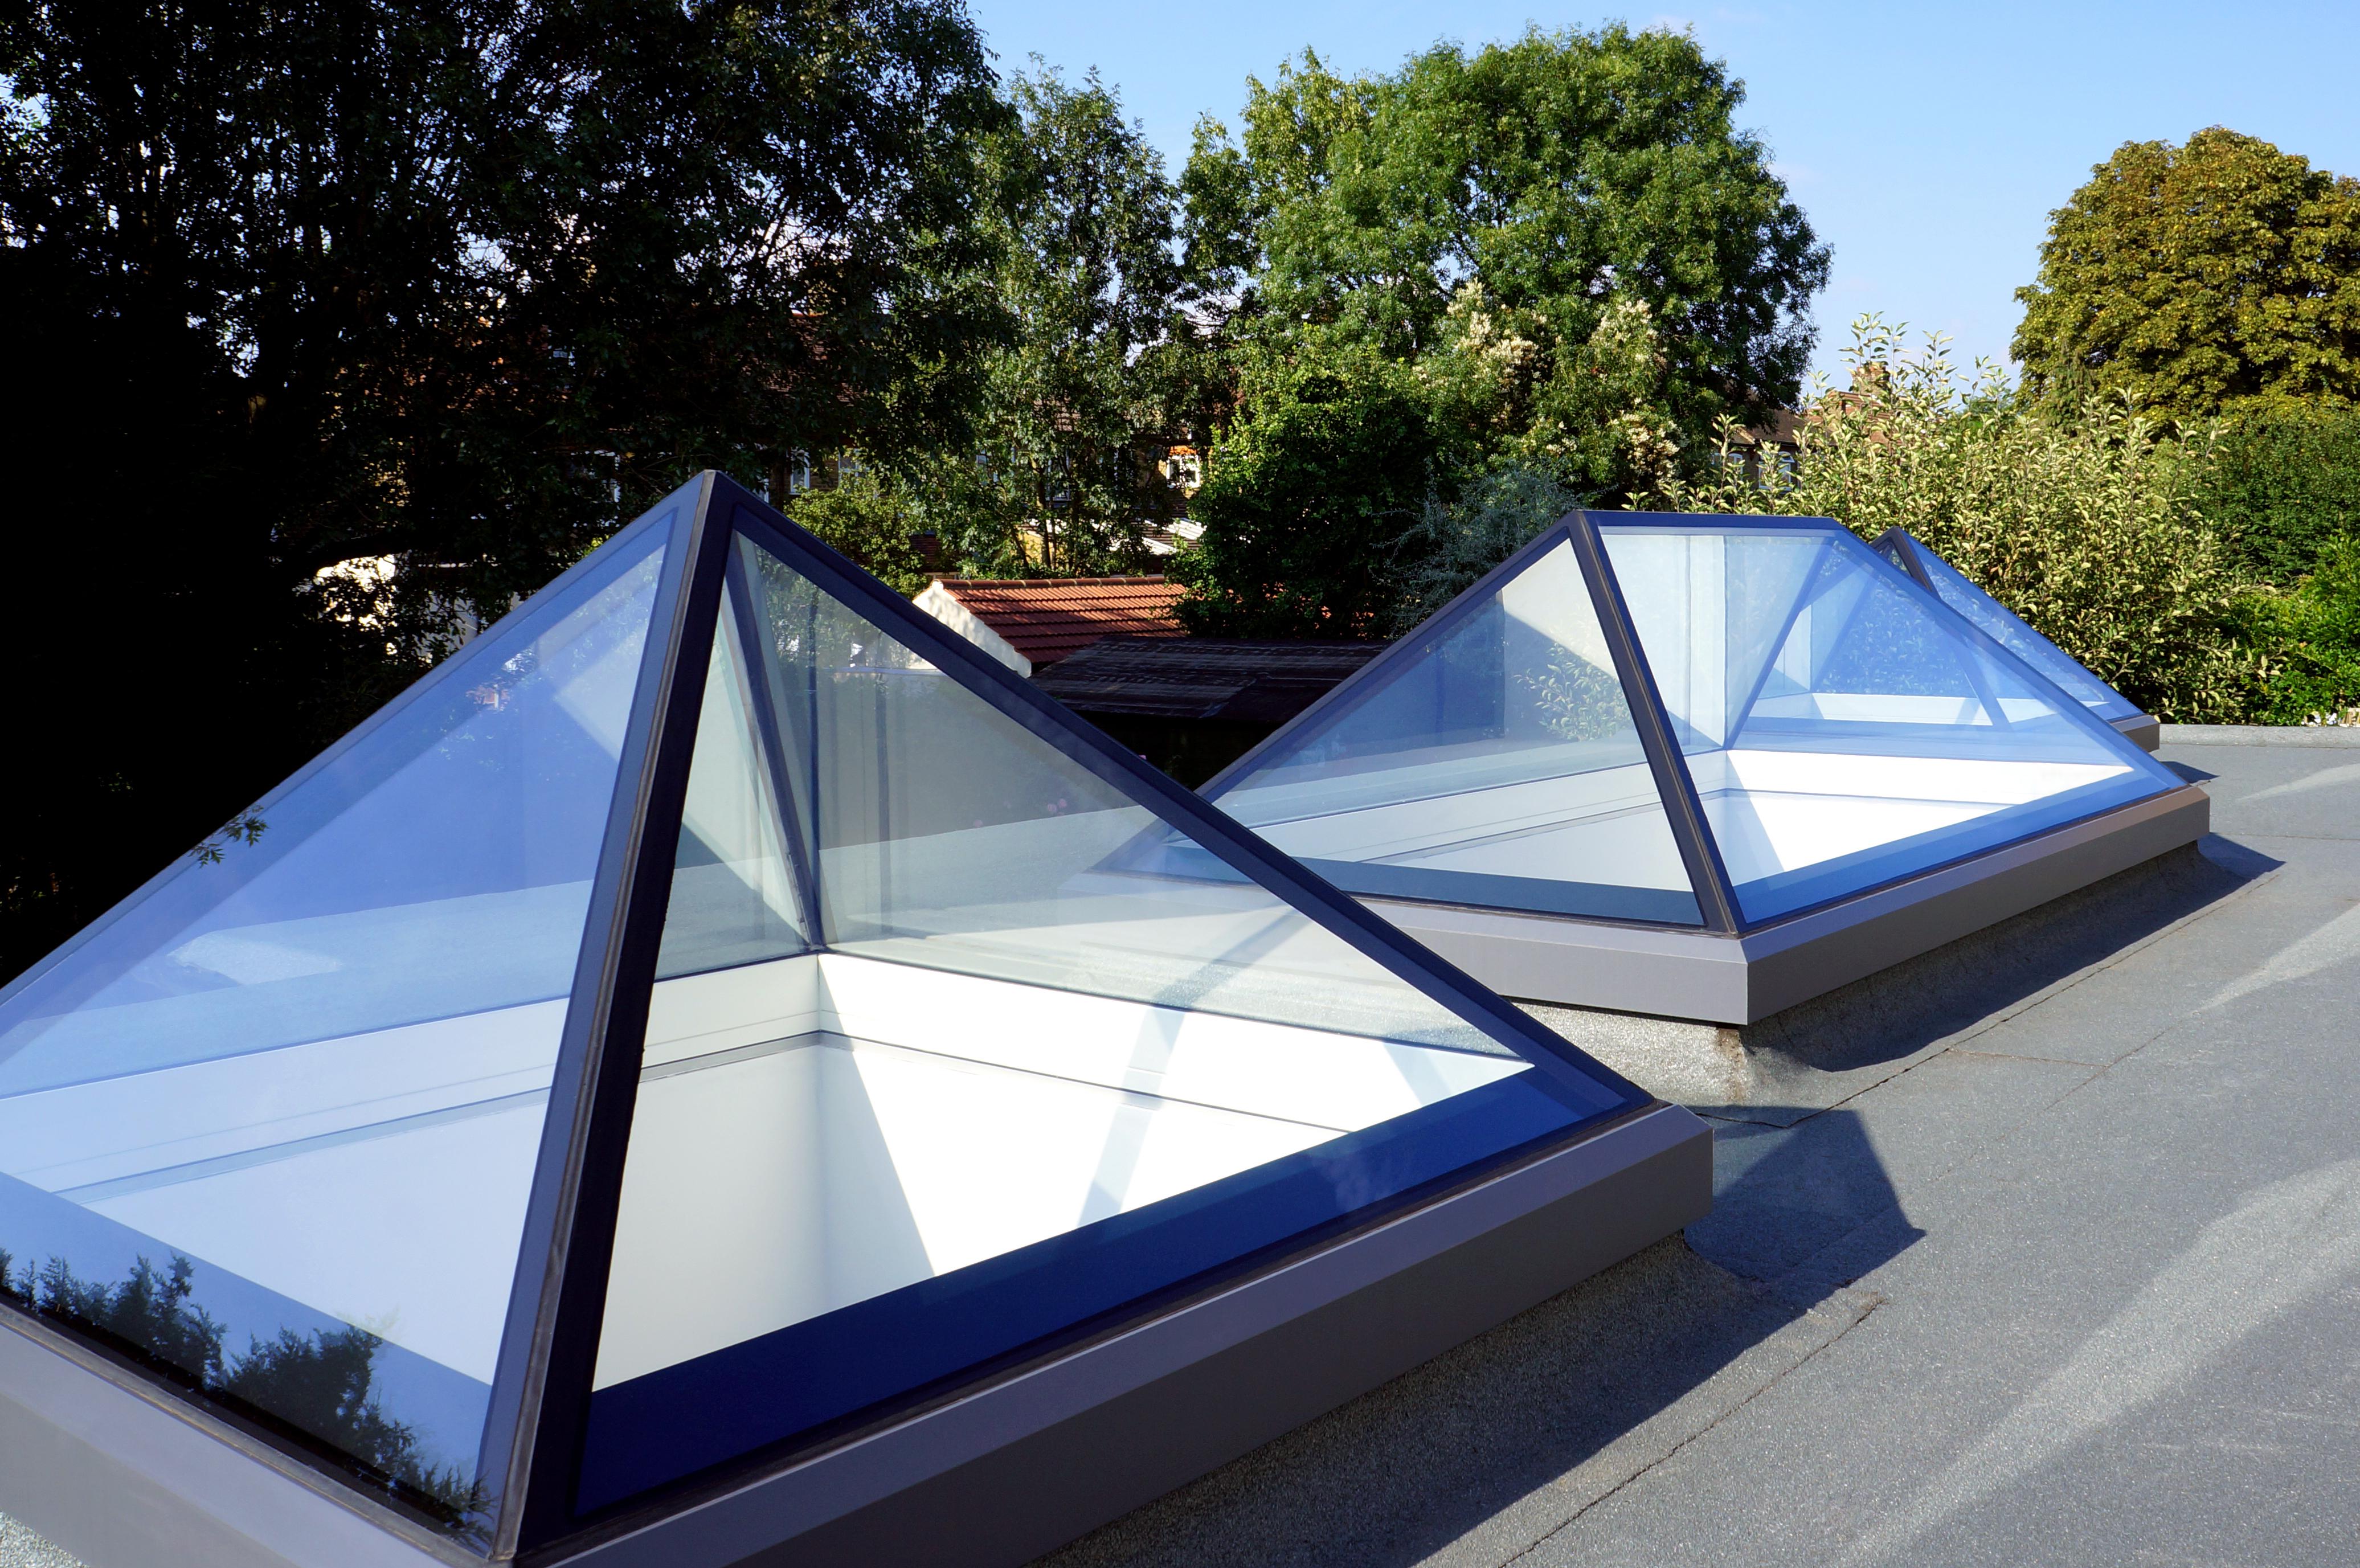 rooftop pyramid skylights